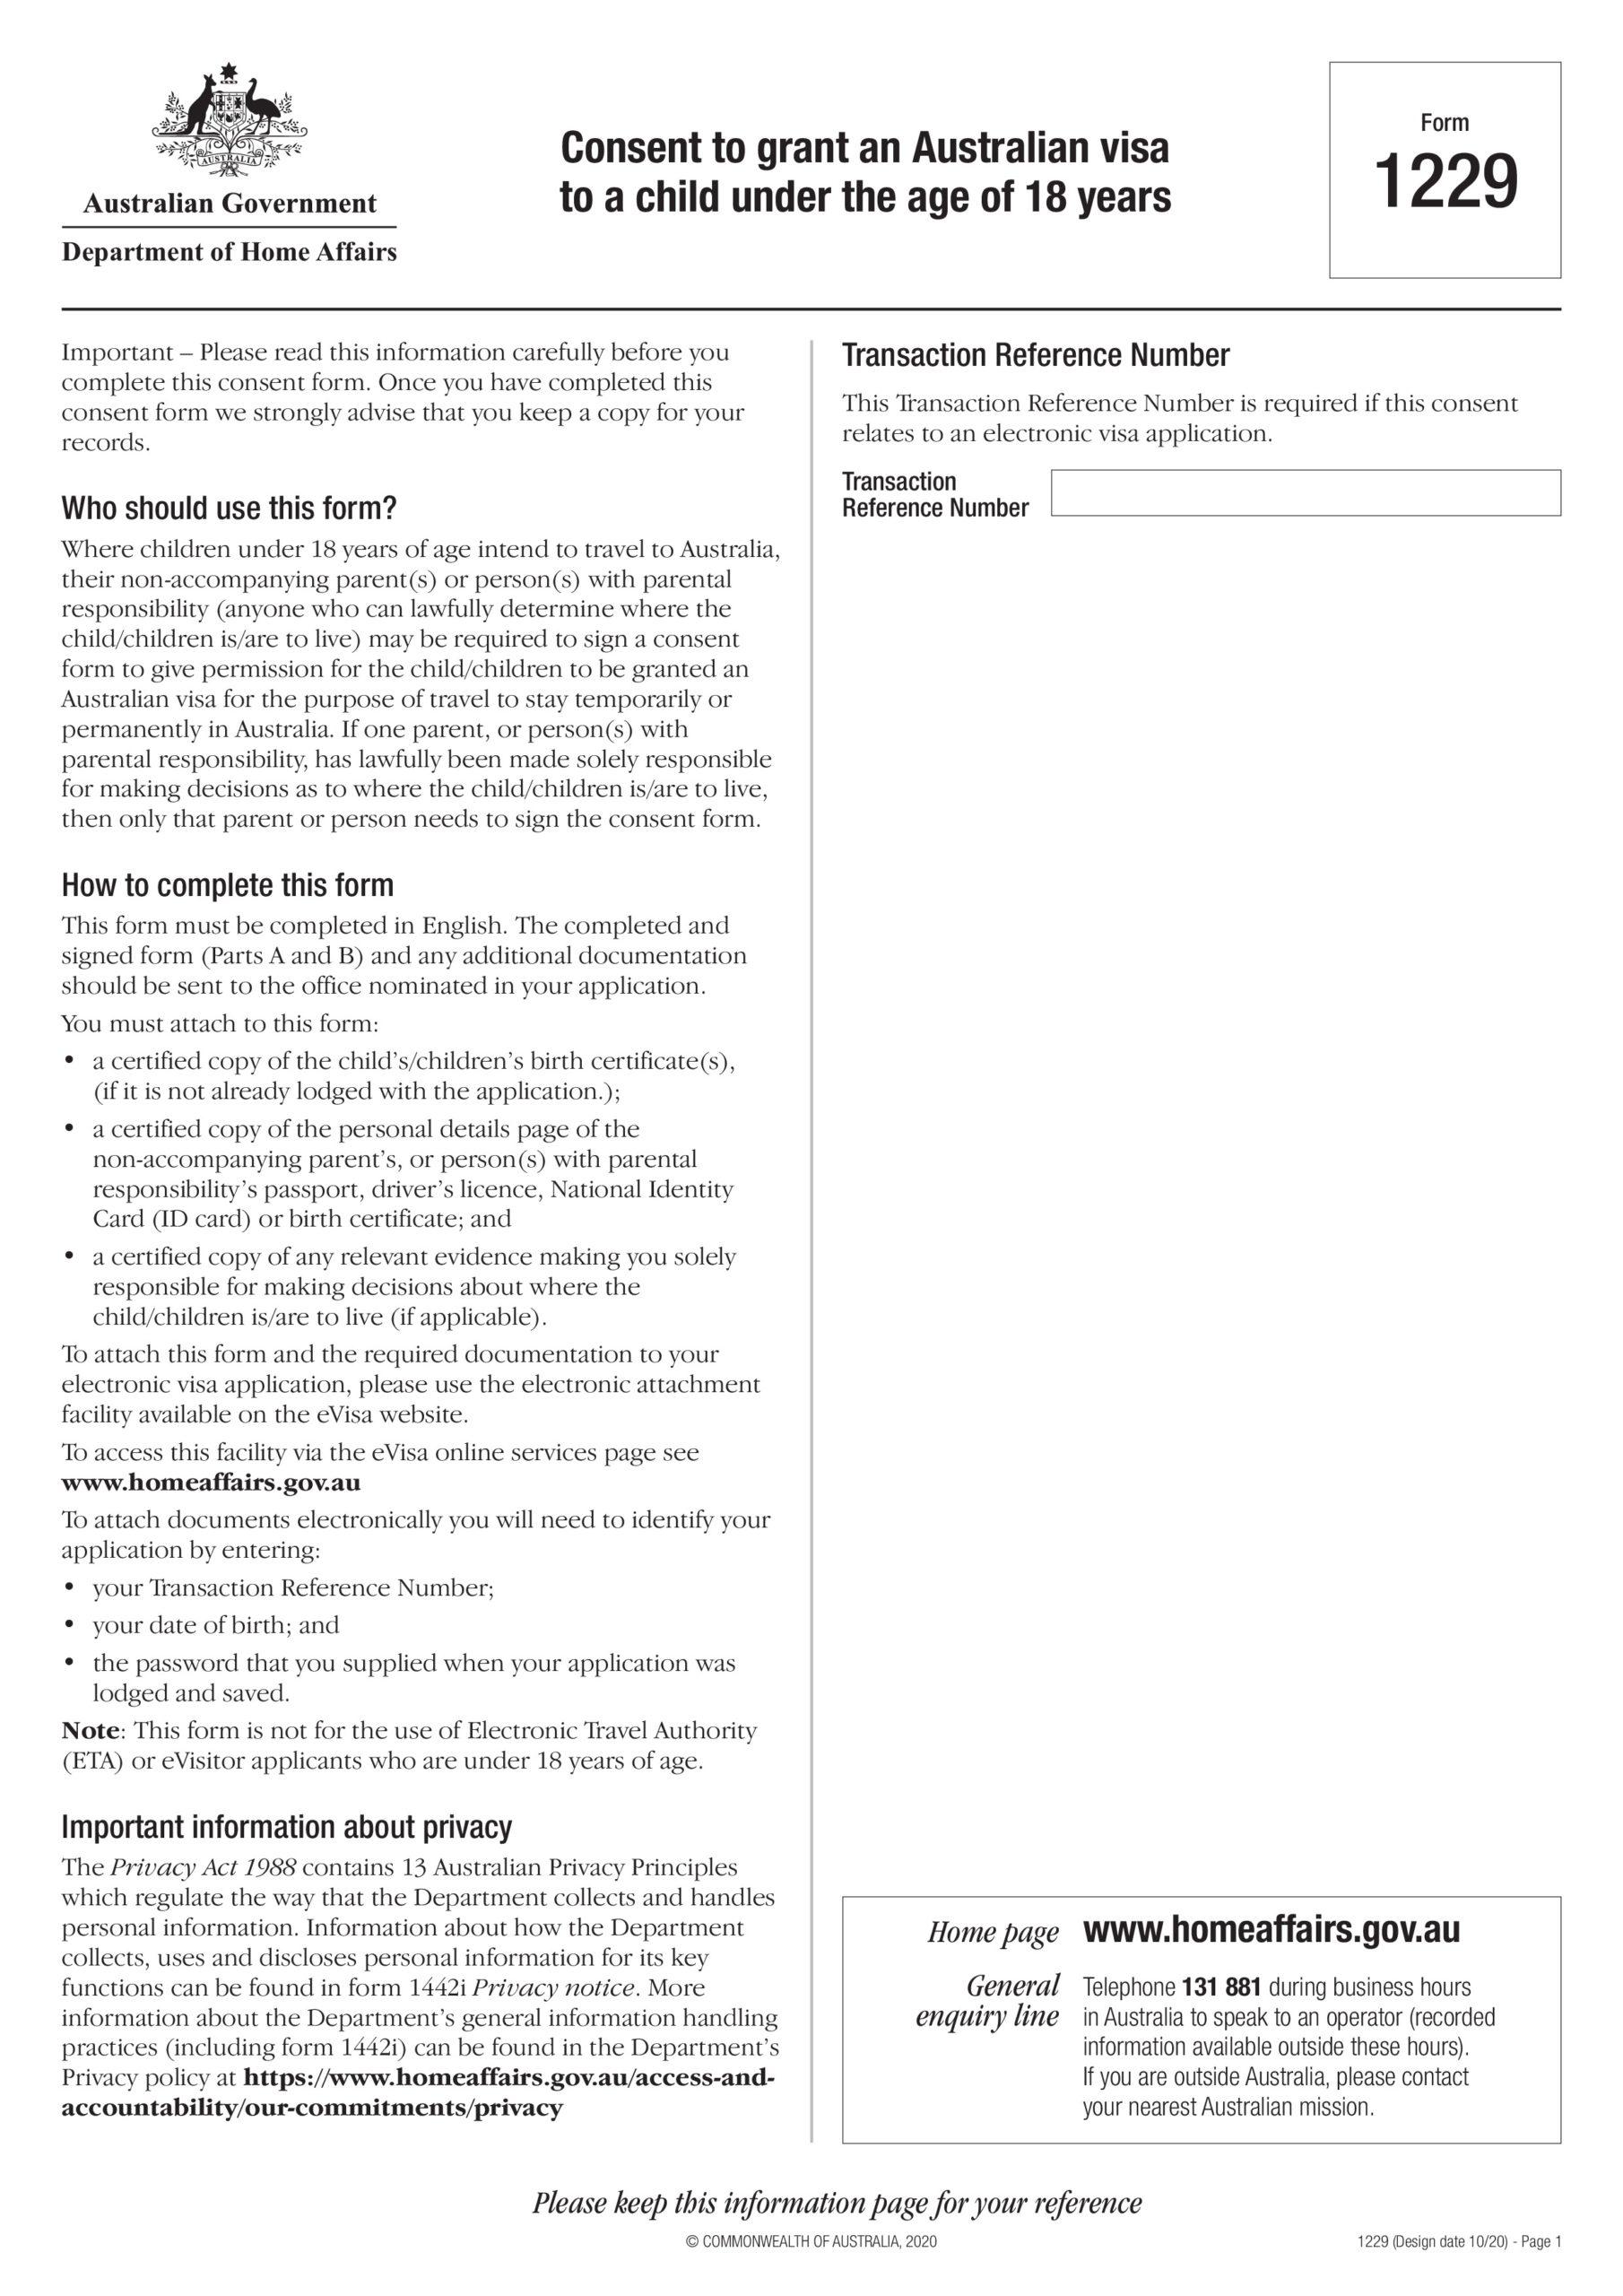 Free child travel consent form 24